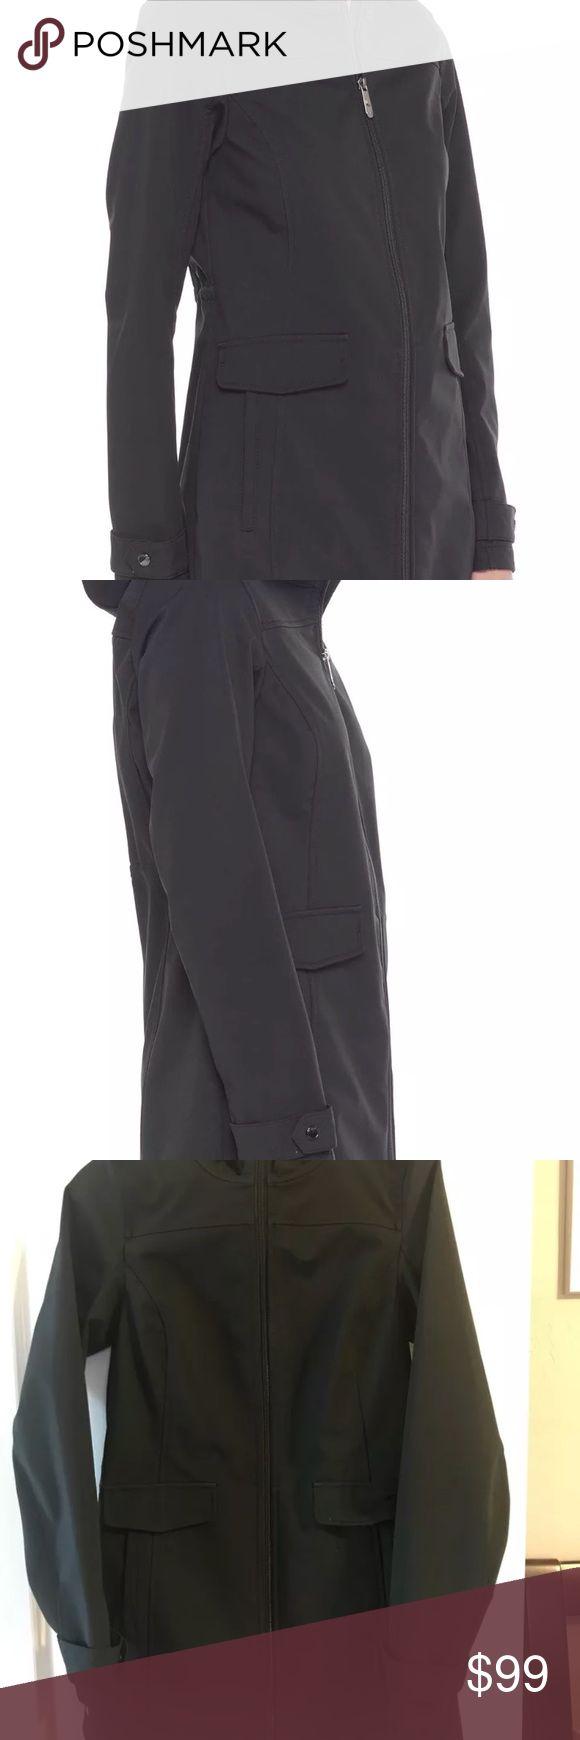 Lole Avenue Jacket XS Cute Lole Avenue Jacket in Black Size XS. Waterproof soft shell exterior, lightly fleece line interior. Hood with cinch, waist cinch, flattering cut and longer length. Lole Jackets & Coats